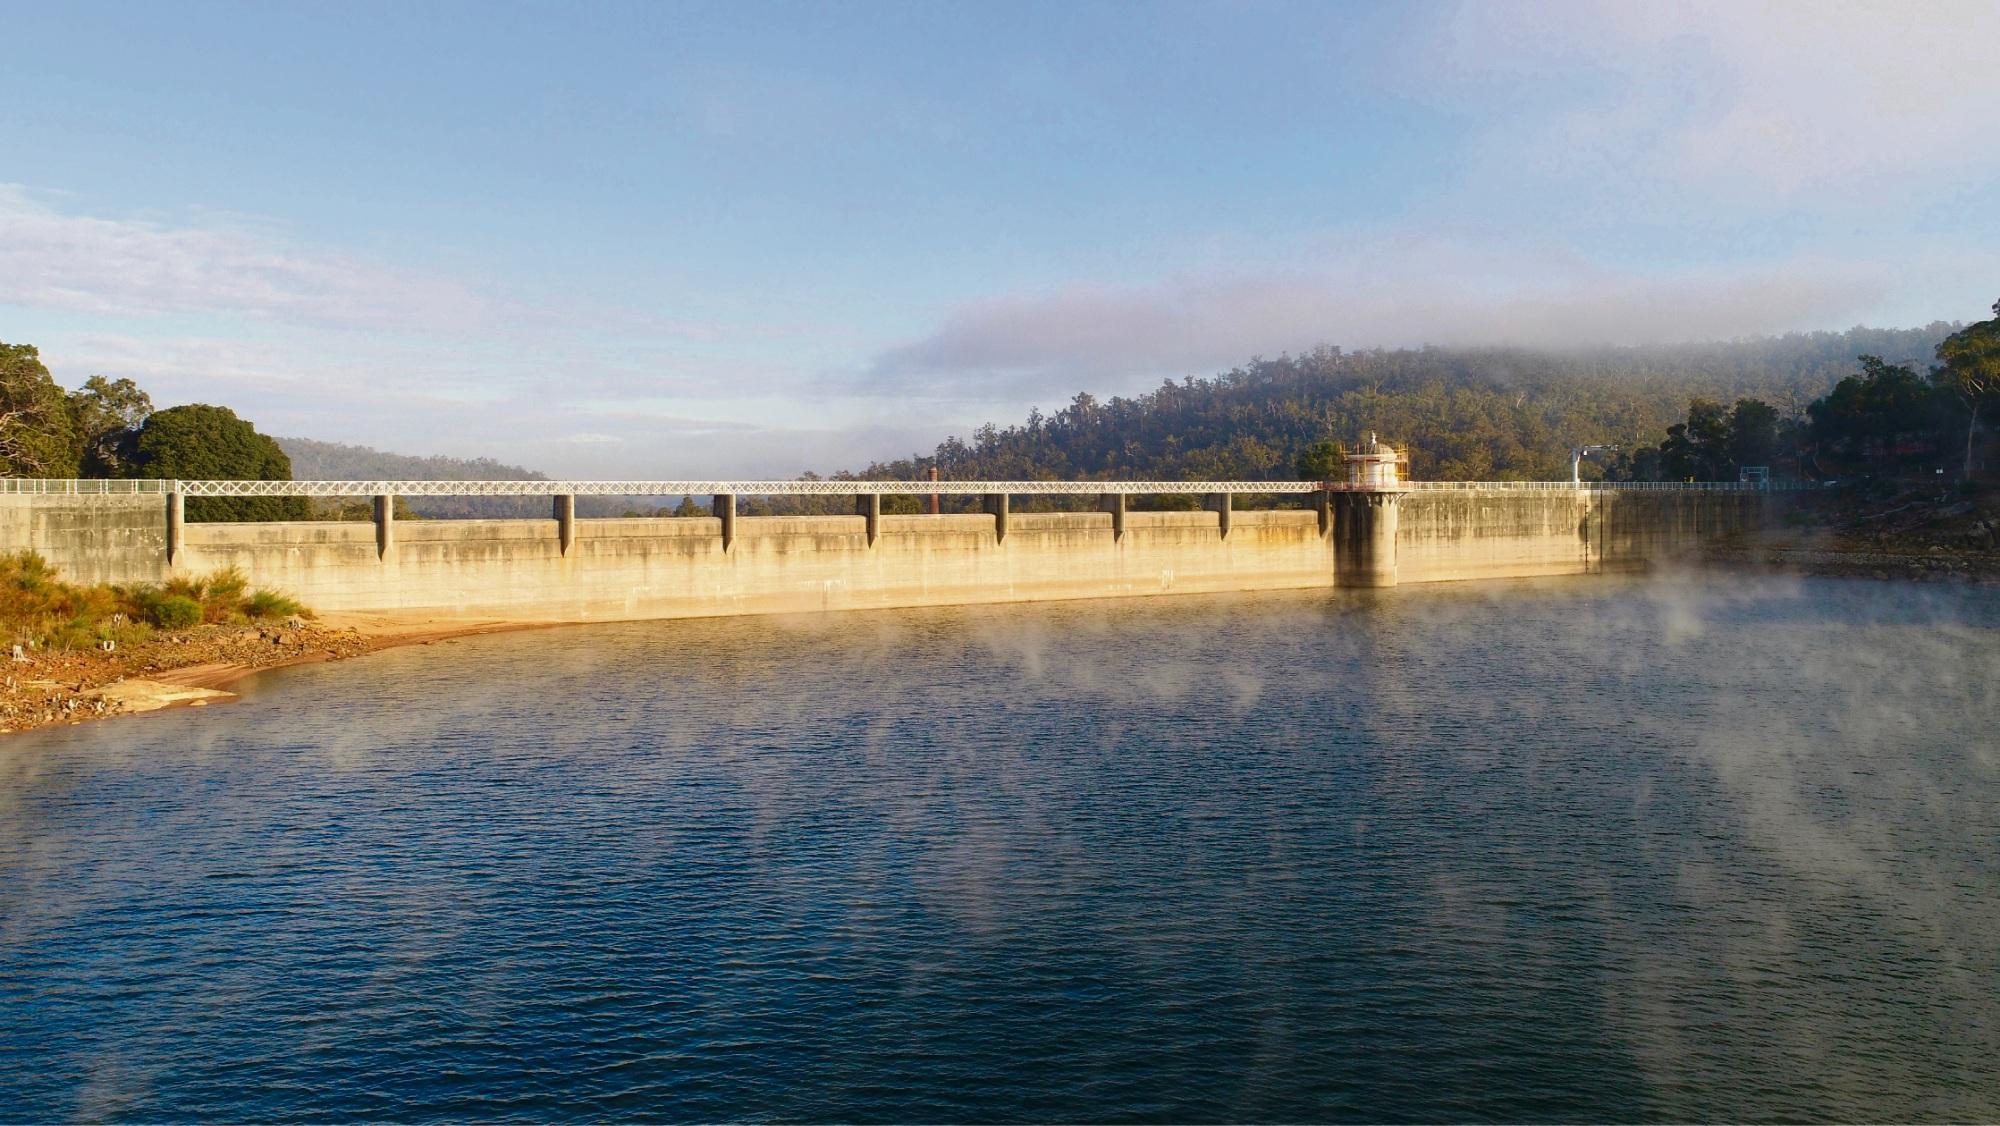 Mundaring Weir.